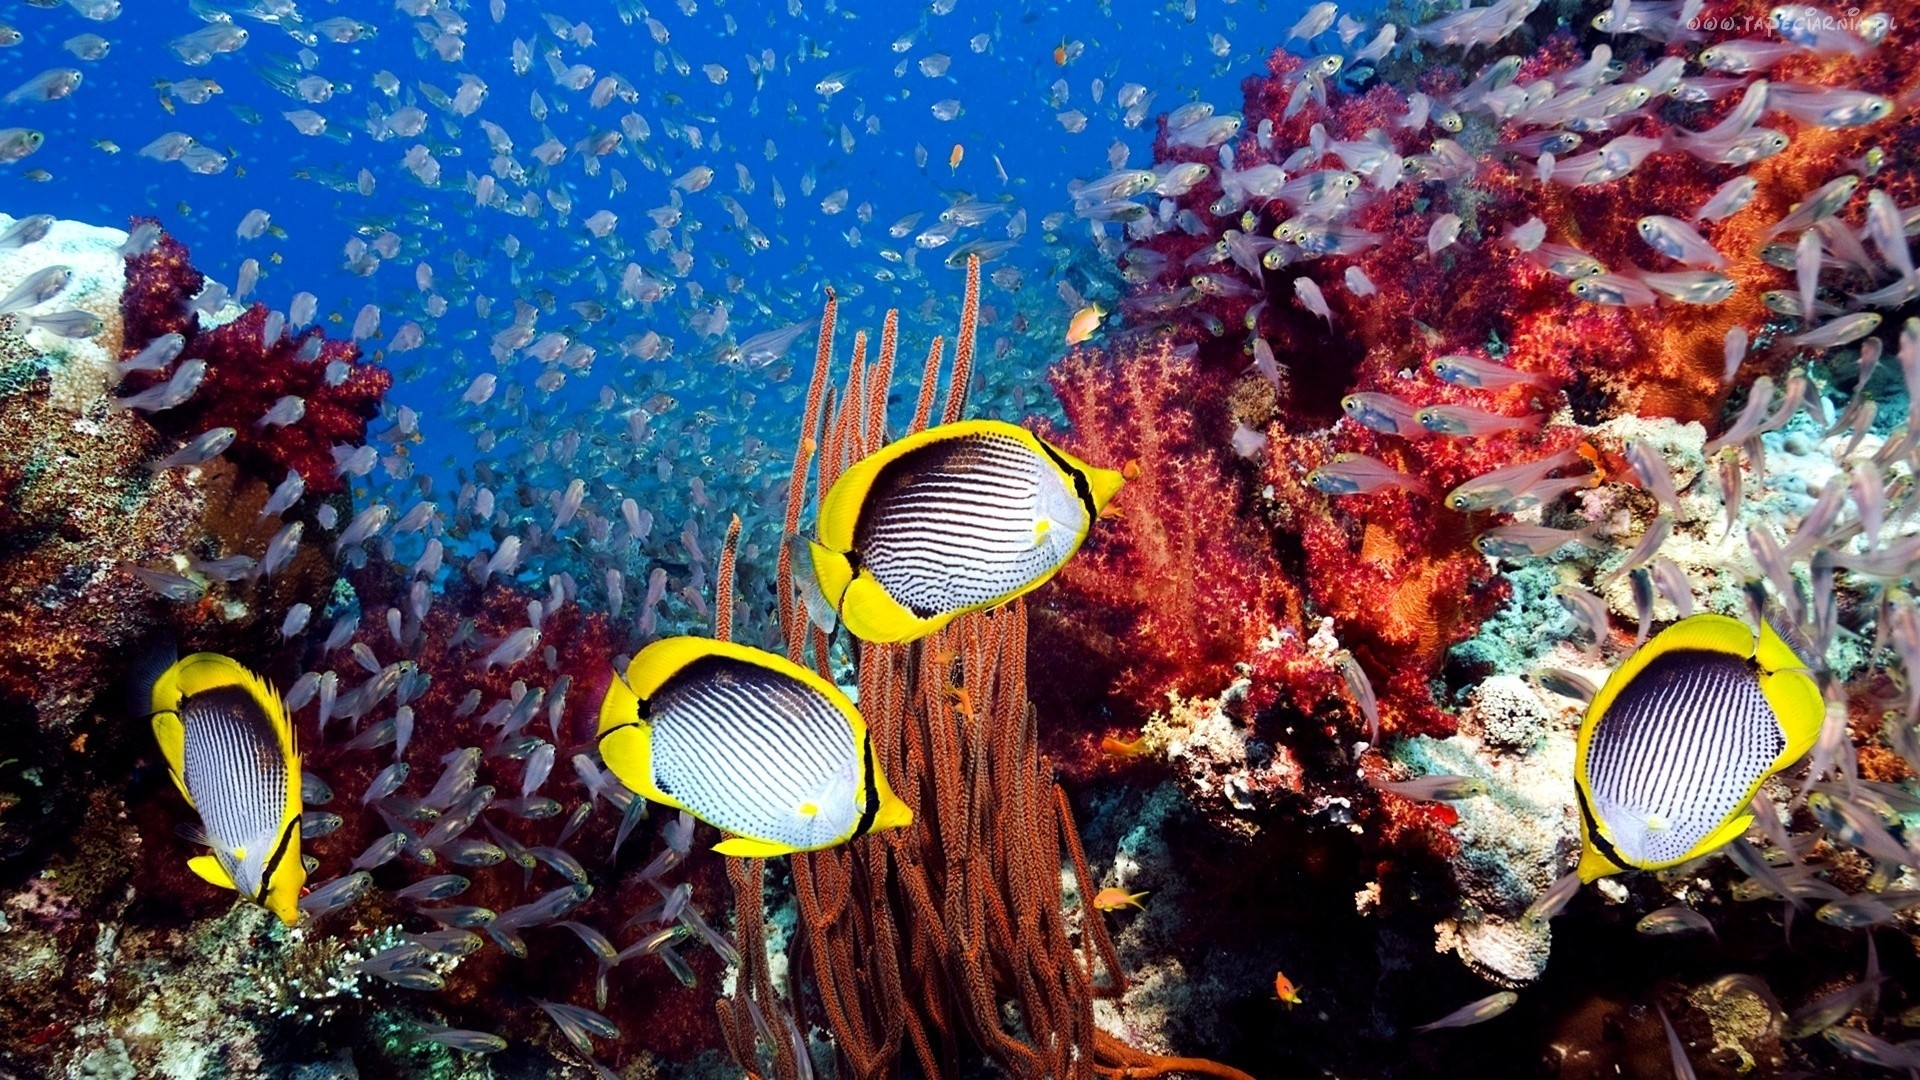 Coral Reef Wallpaper image hd